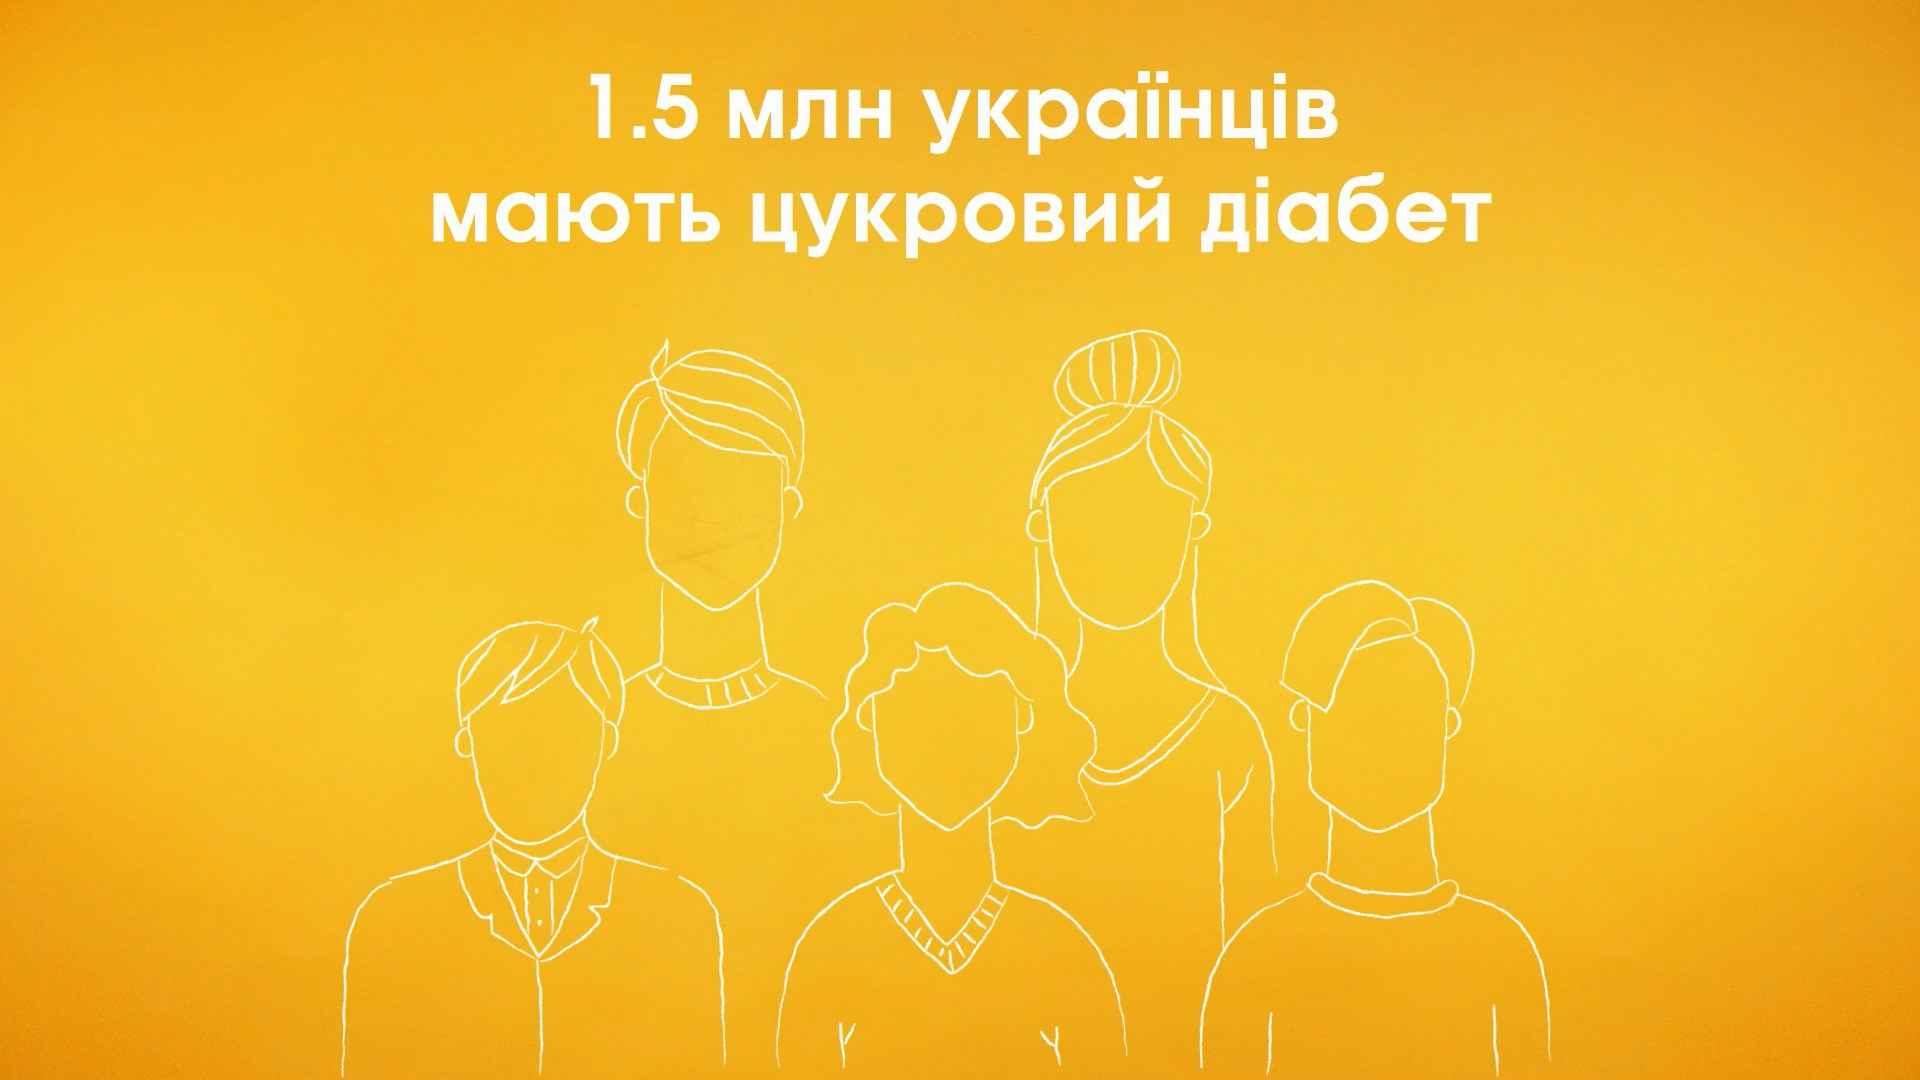 1.5 million Ukrainians have diabetes - Animated Video